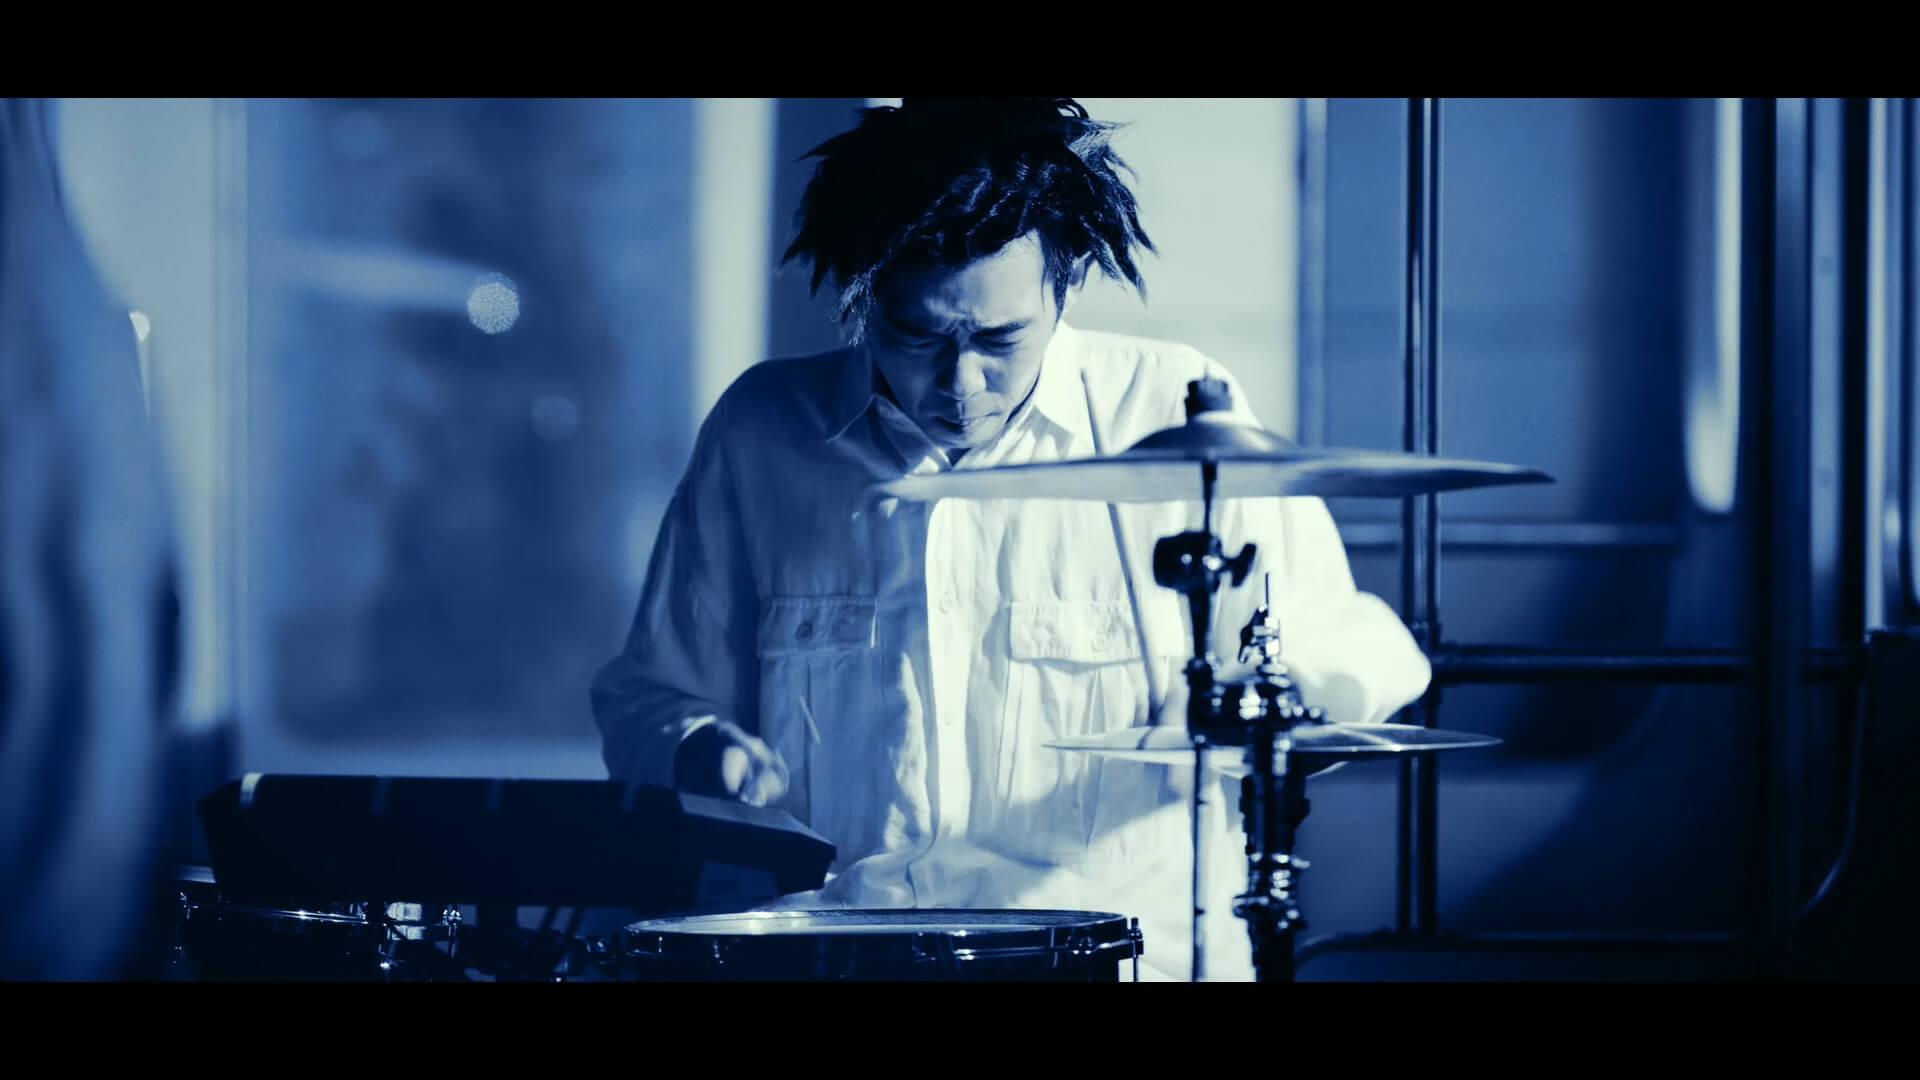 King Gnu、ソニーの完全ワイヤレス型ノイキャンイヤホン『WF-1000XM3』の新CMに出演 CMソングに「Teenager Forever」を初音源化 music191001_kinggnu_cm_5